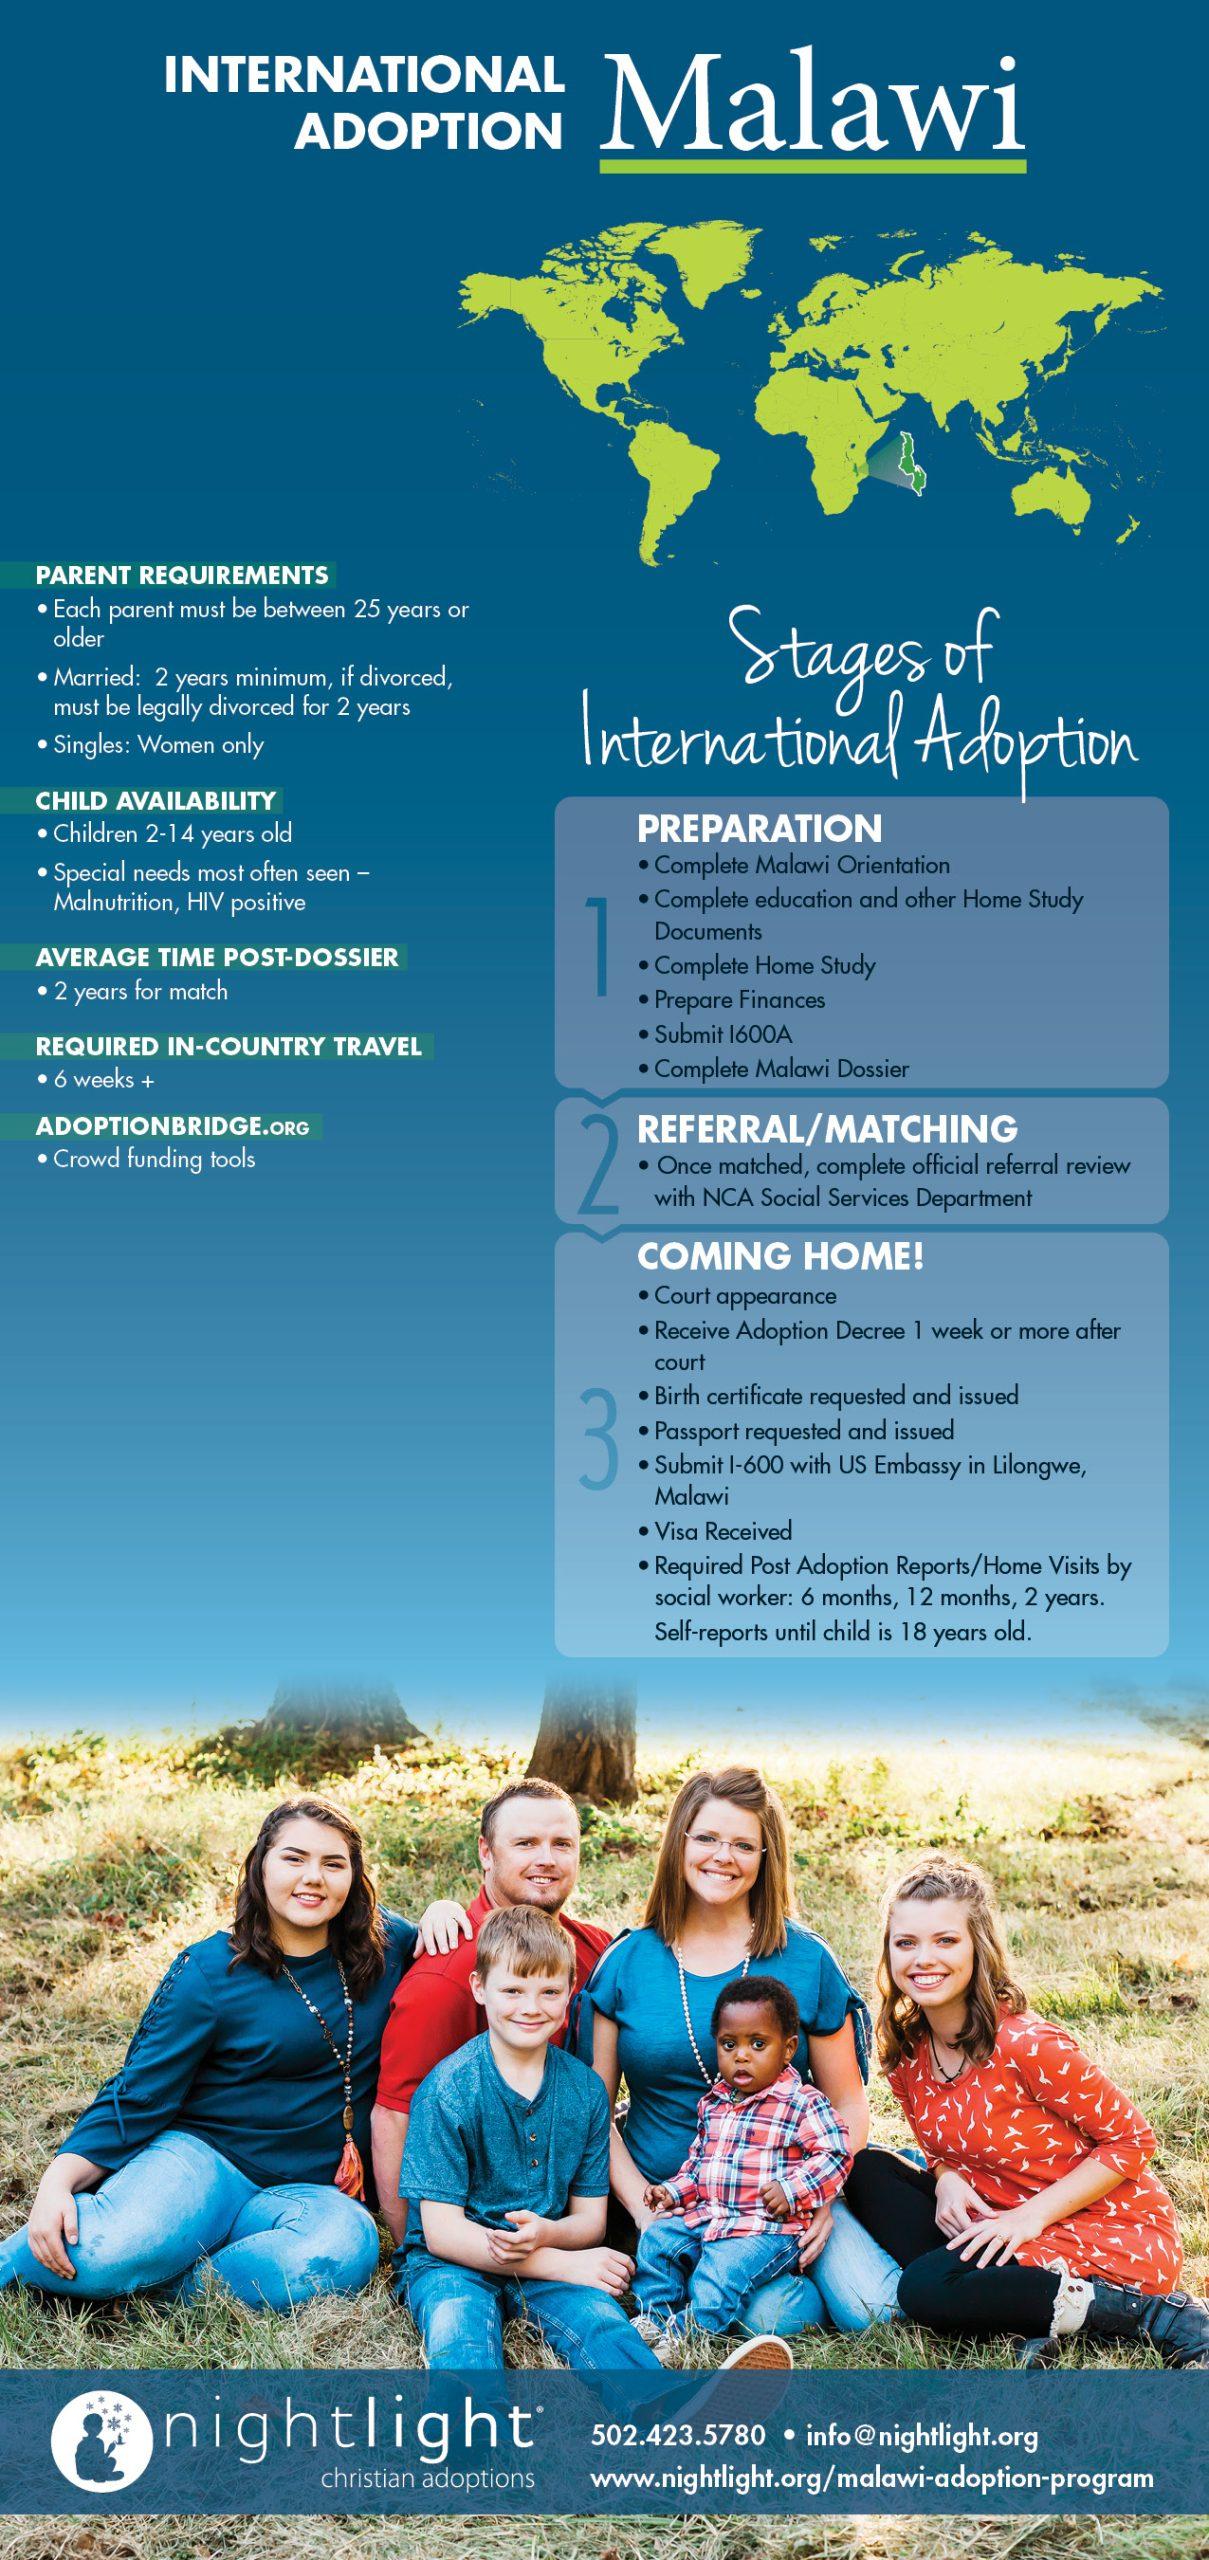 Malawi adoption